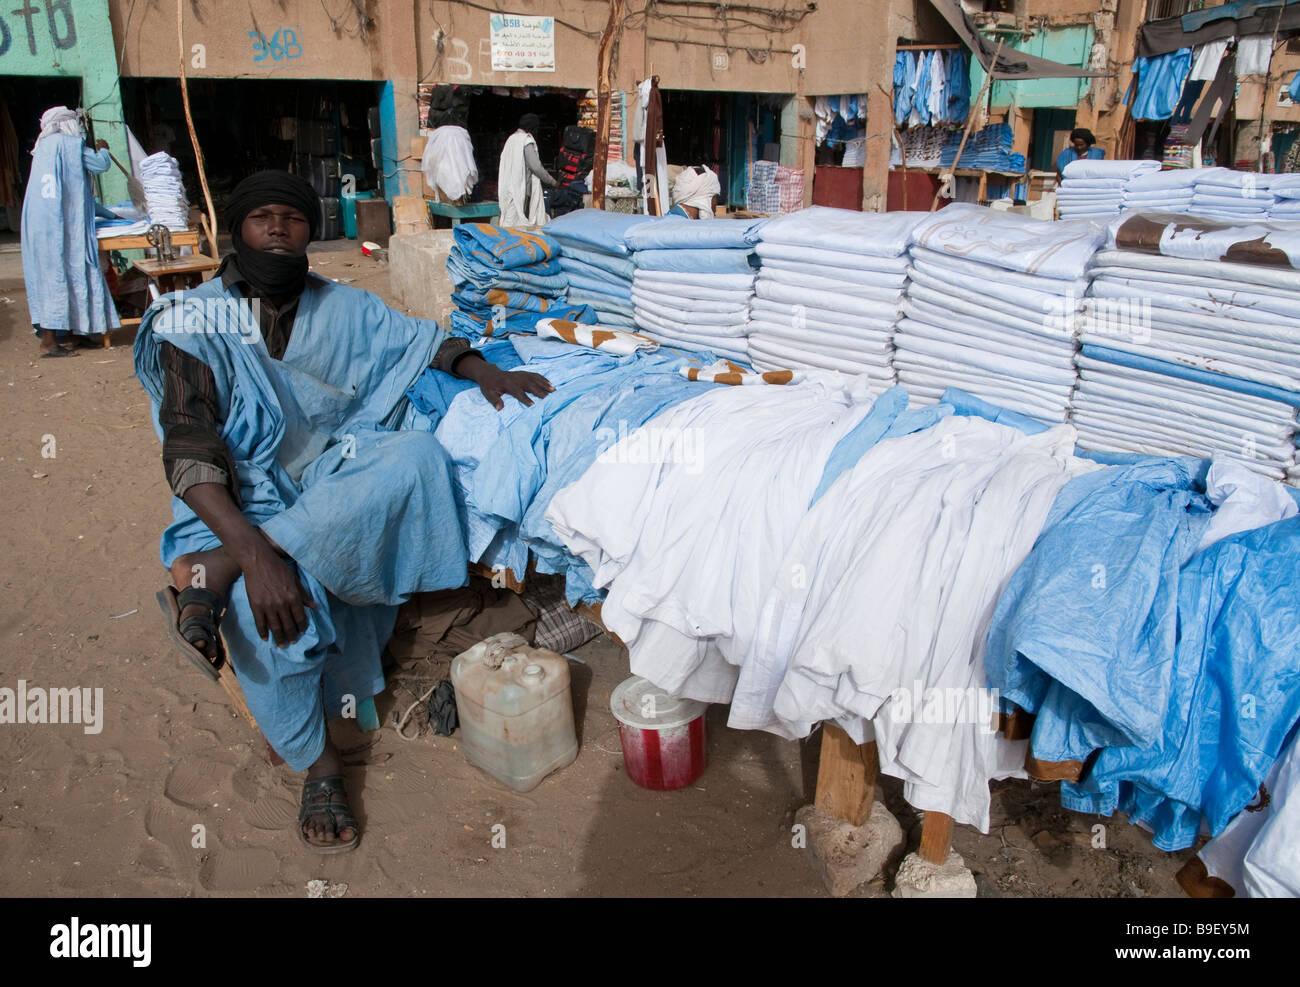 West Africa Mauritania Nouakchott City Centre Main Market - Stock Image